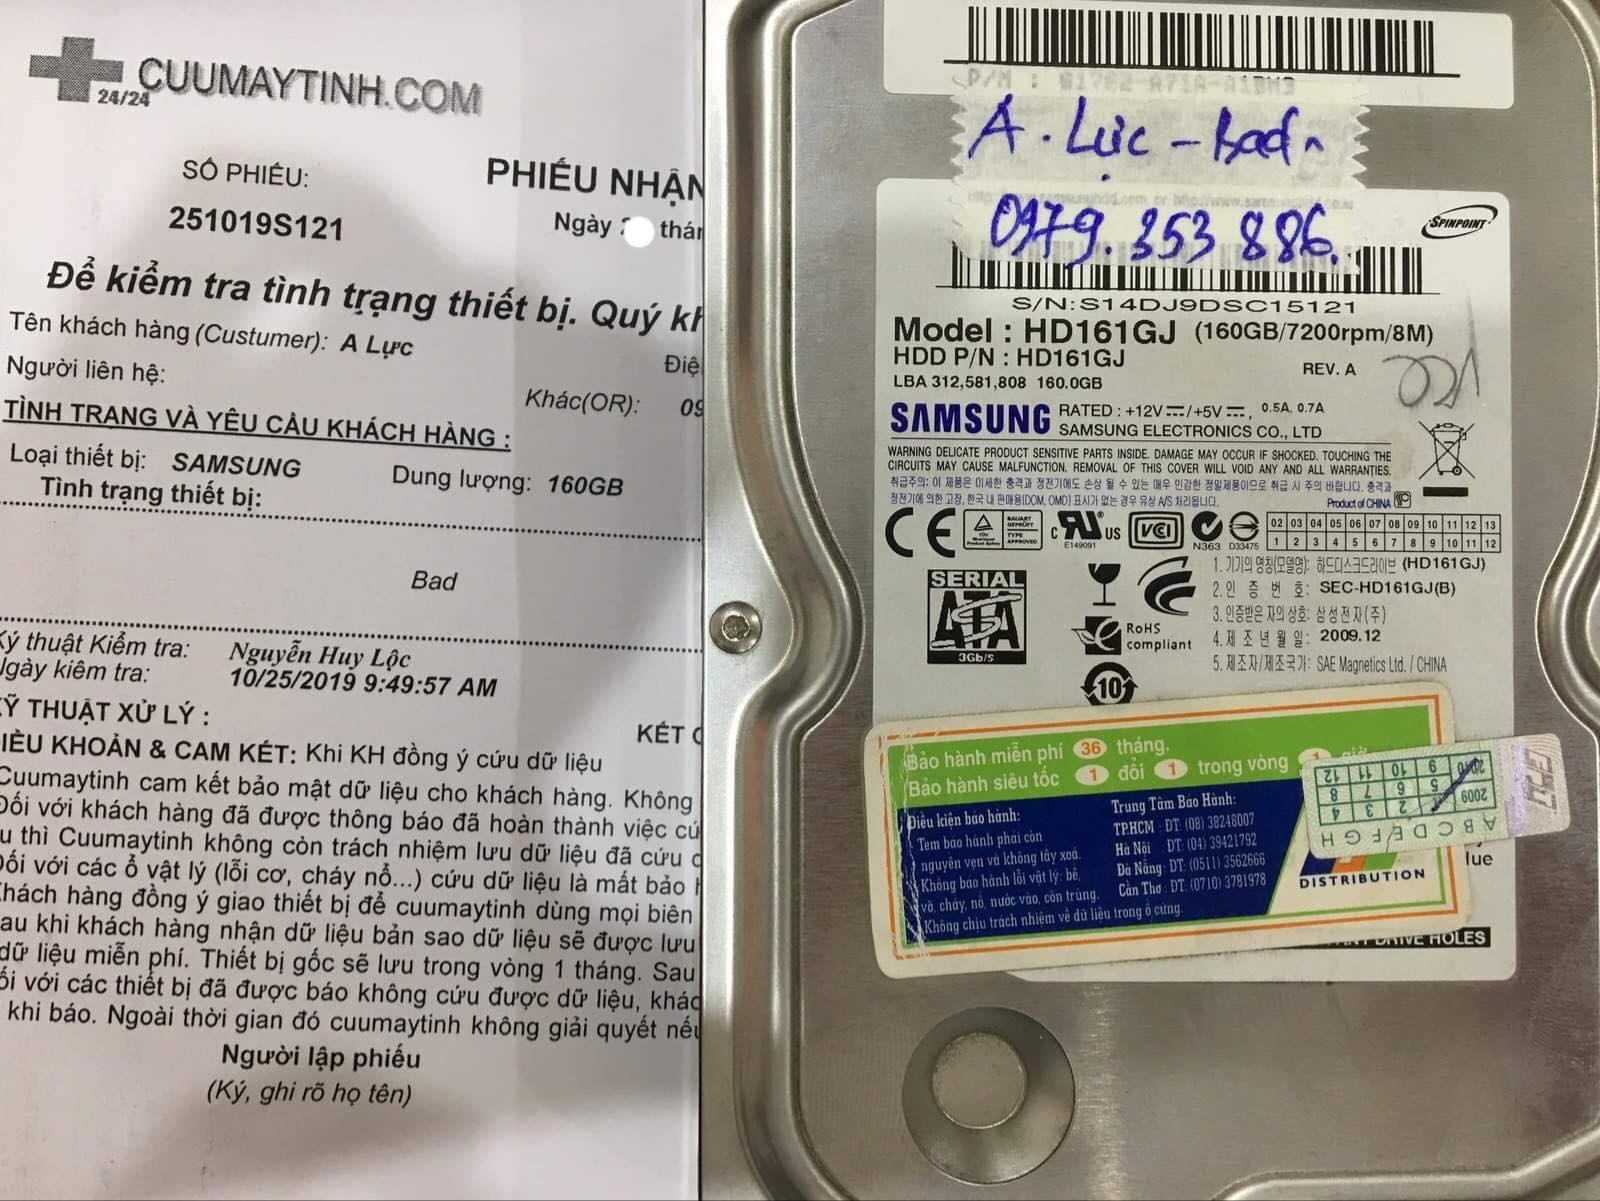 Cứu dữ liệu ổ cứng Samsung 160GB bad  06/11/2019 - cuumaytinh